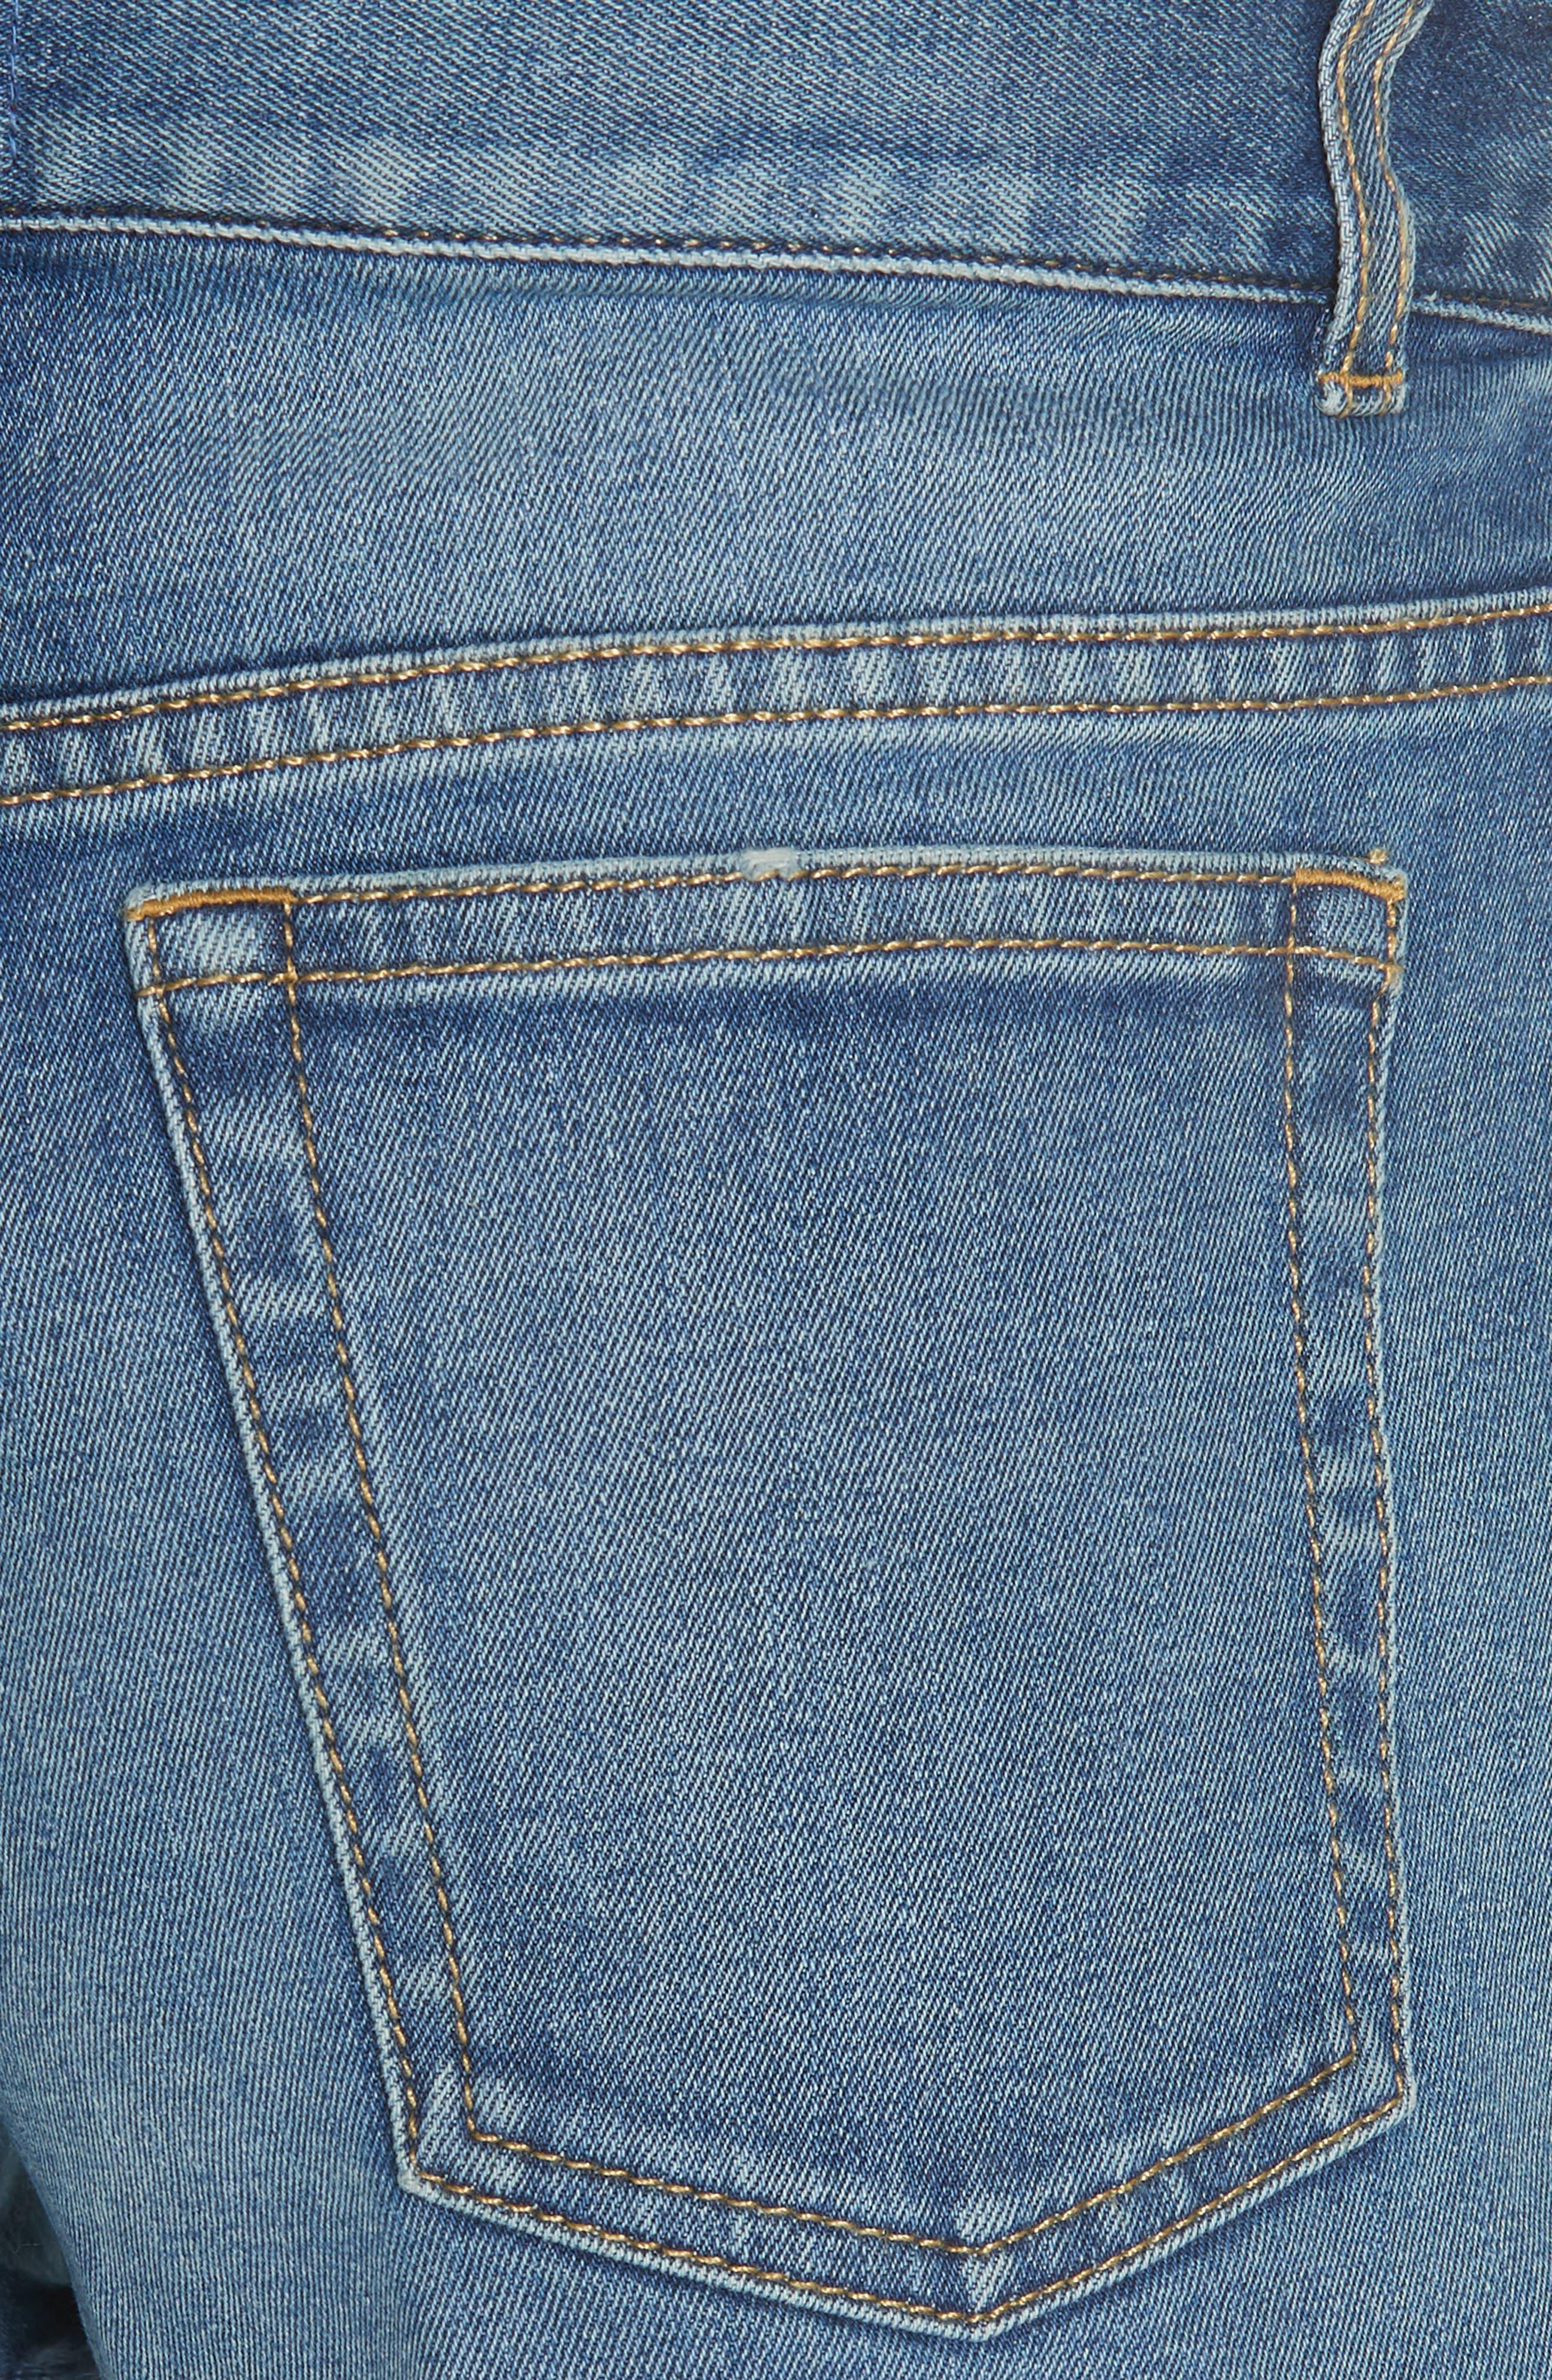 AO.LA Embroidered Denim Shorts,                             Alternate thumbnail 5, color,                             Multi